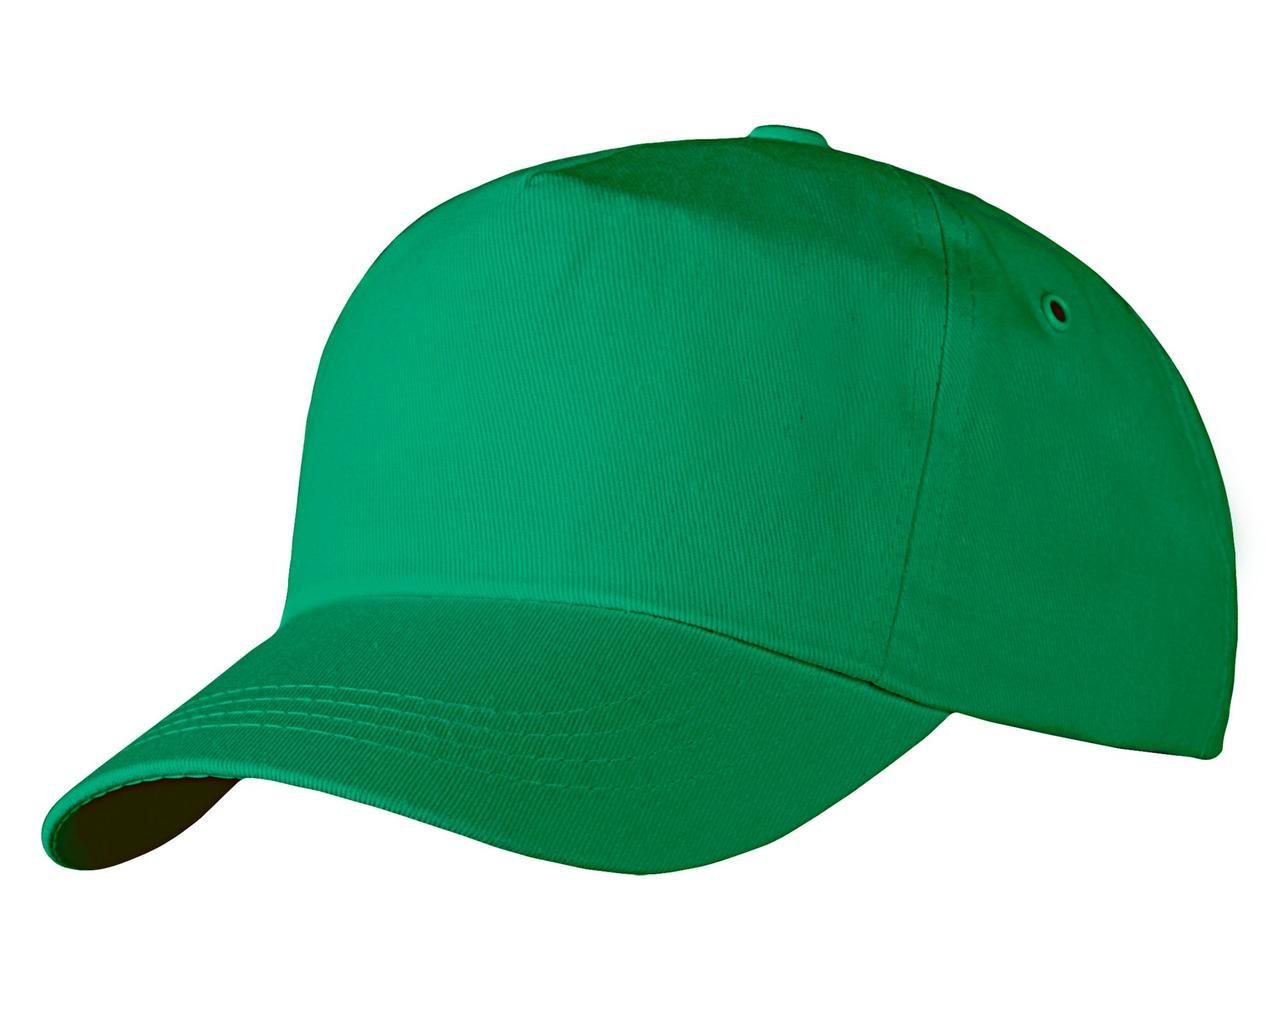 Бейсболка Unit Promo, зеленая (артикул 1846.90)